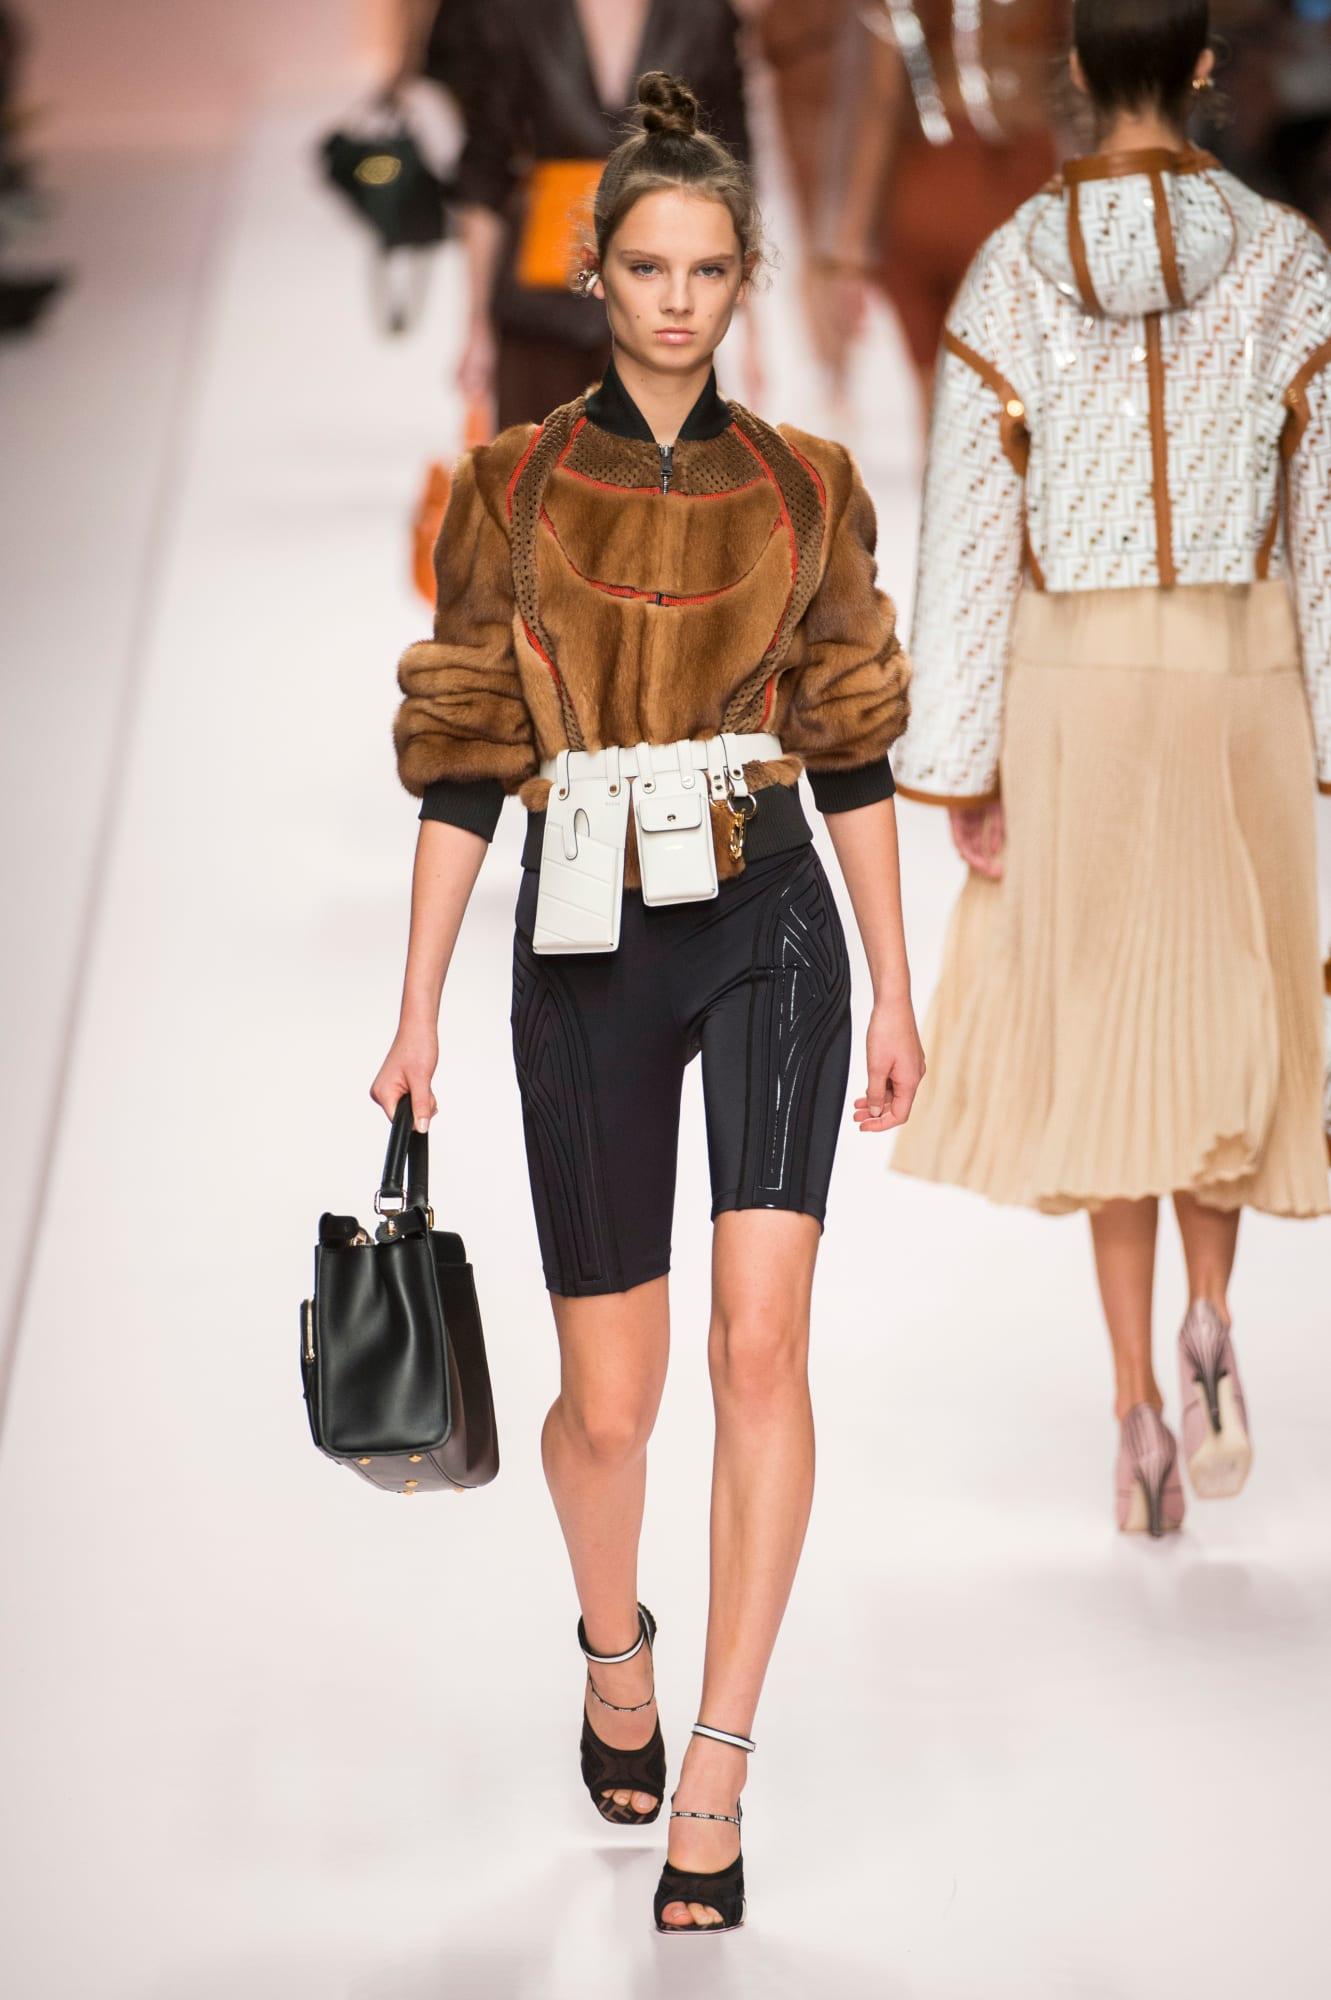 fashion-week-spring-2019-trend-bike-shorts-fendi-2.jpg